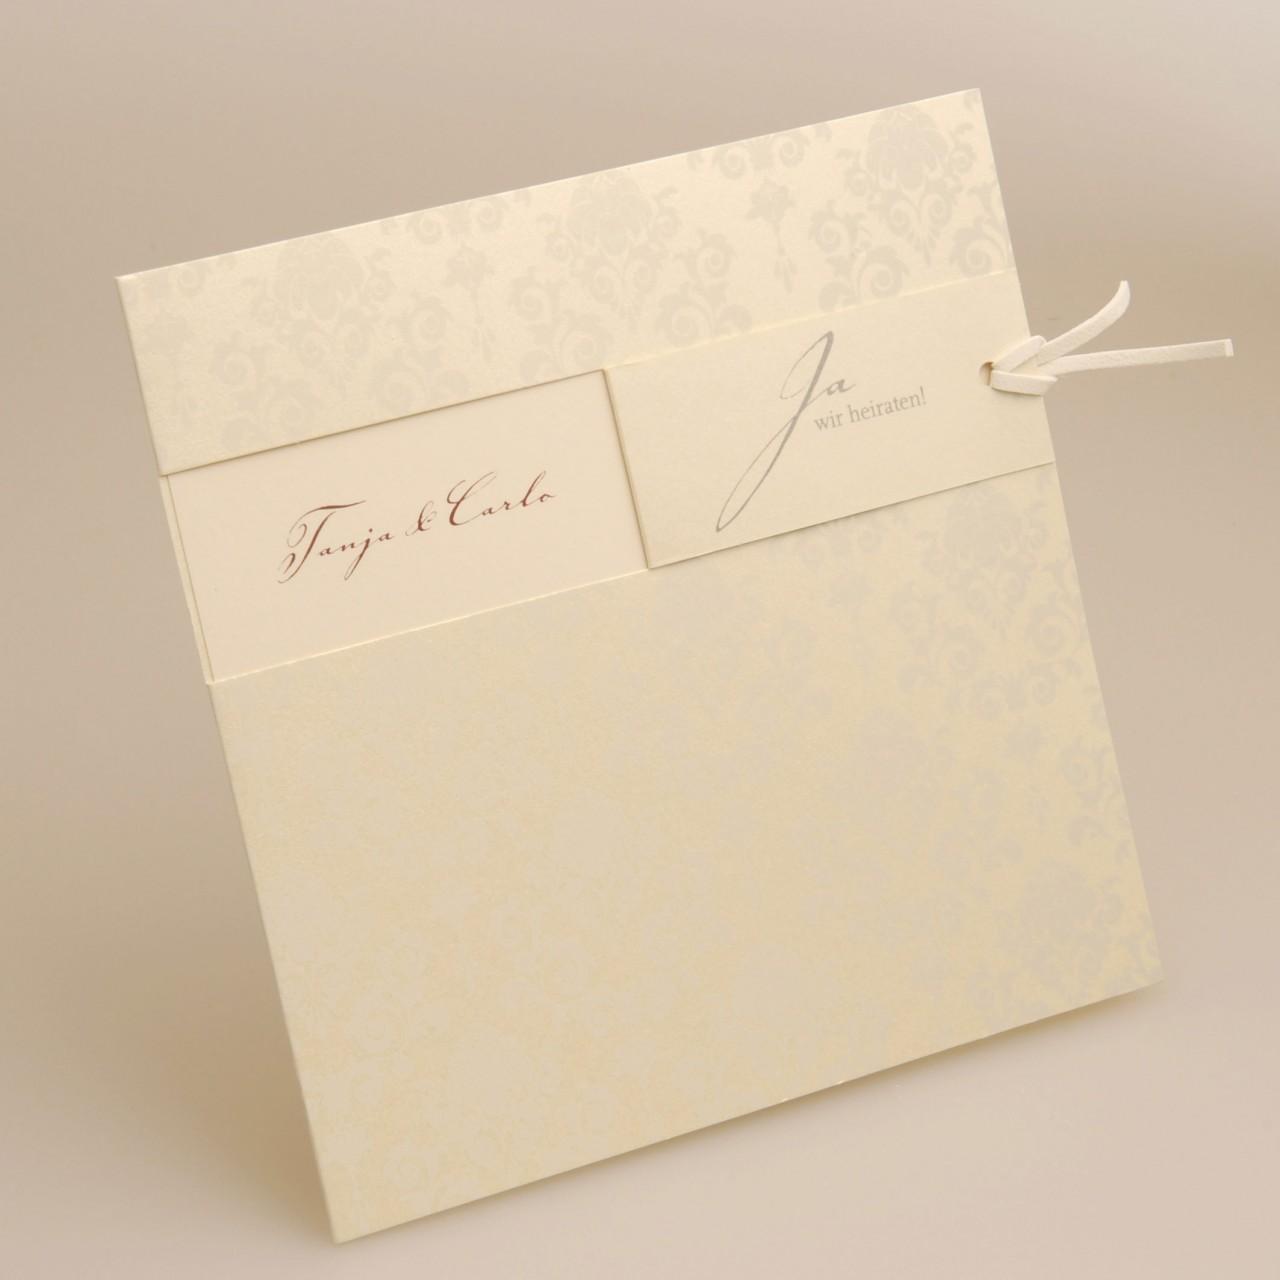 Einladungskarte - H 1838